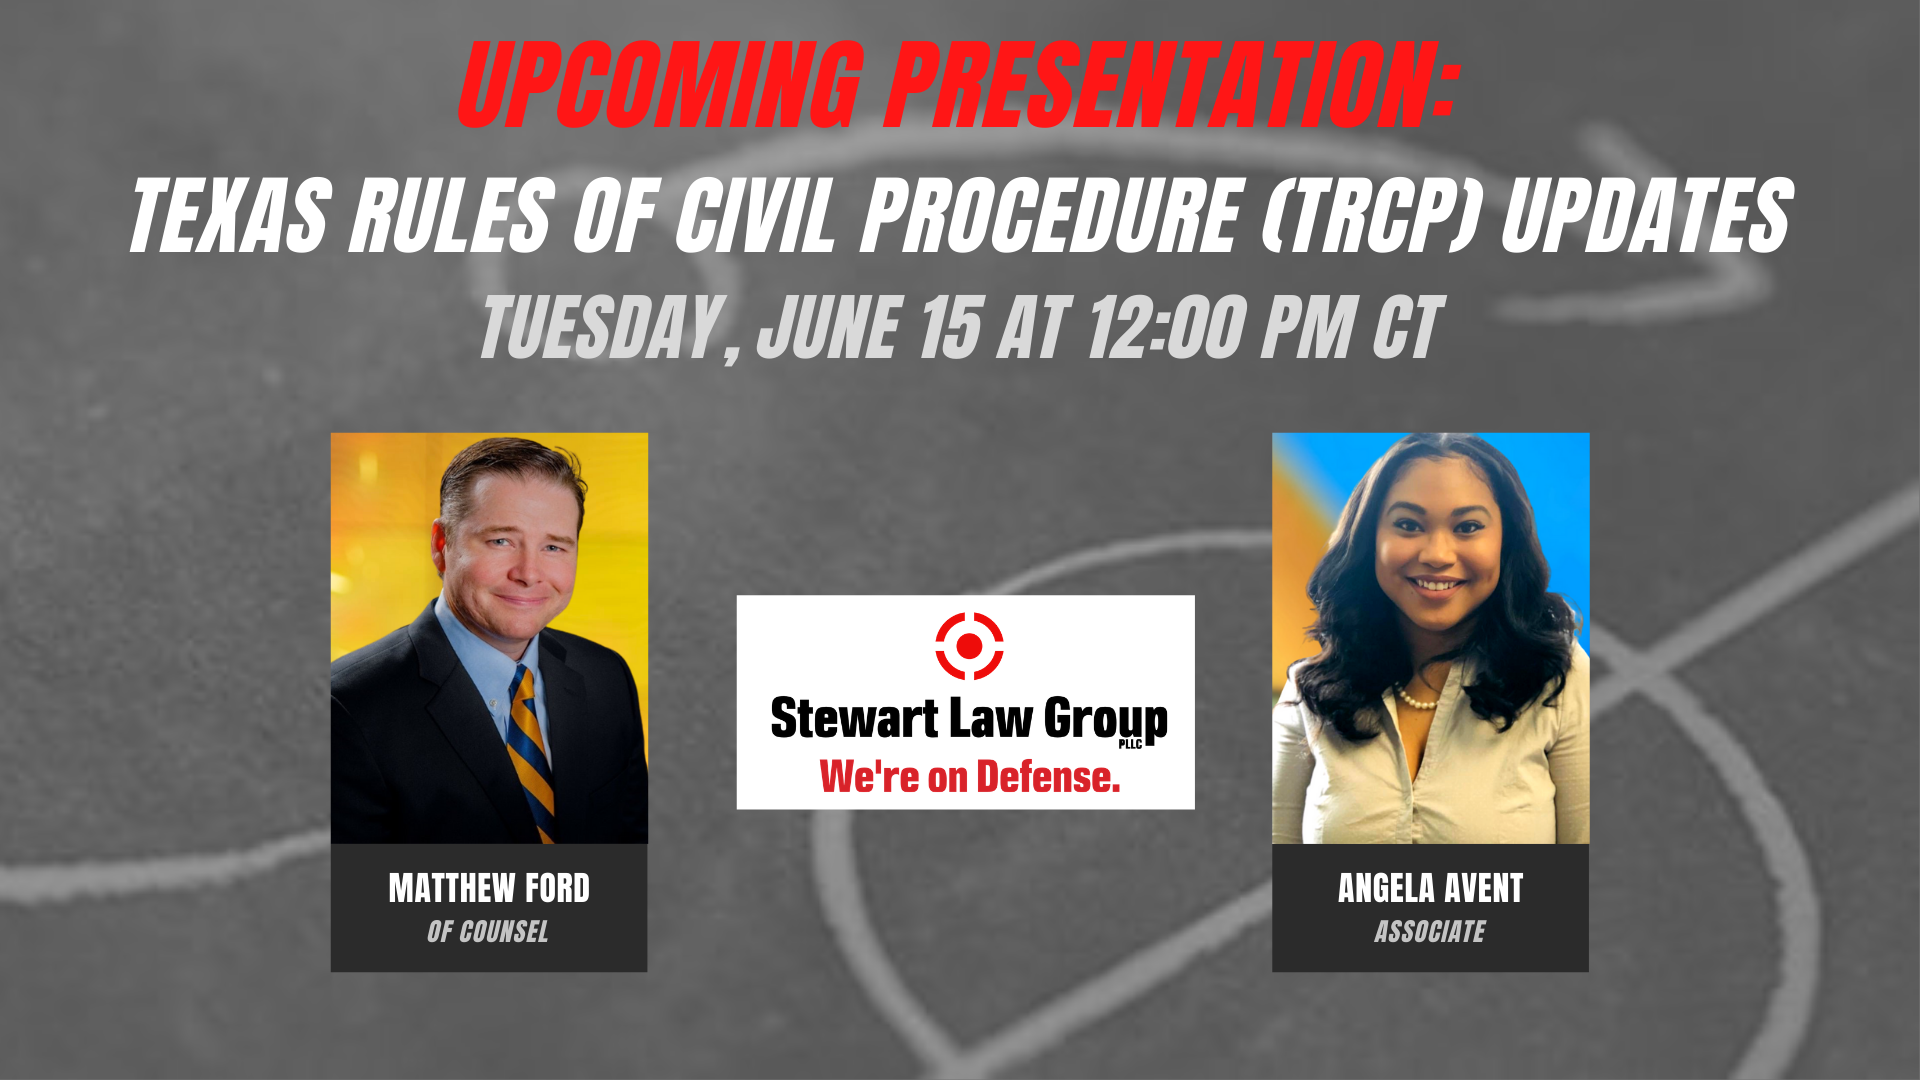 Stewart Law Group